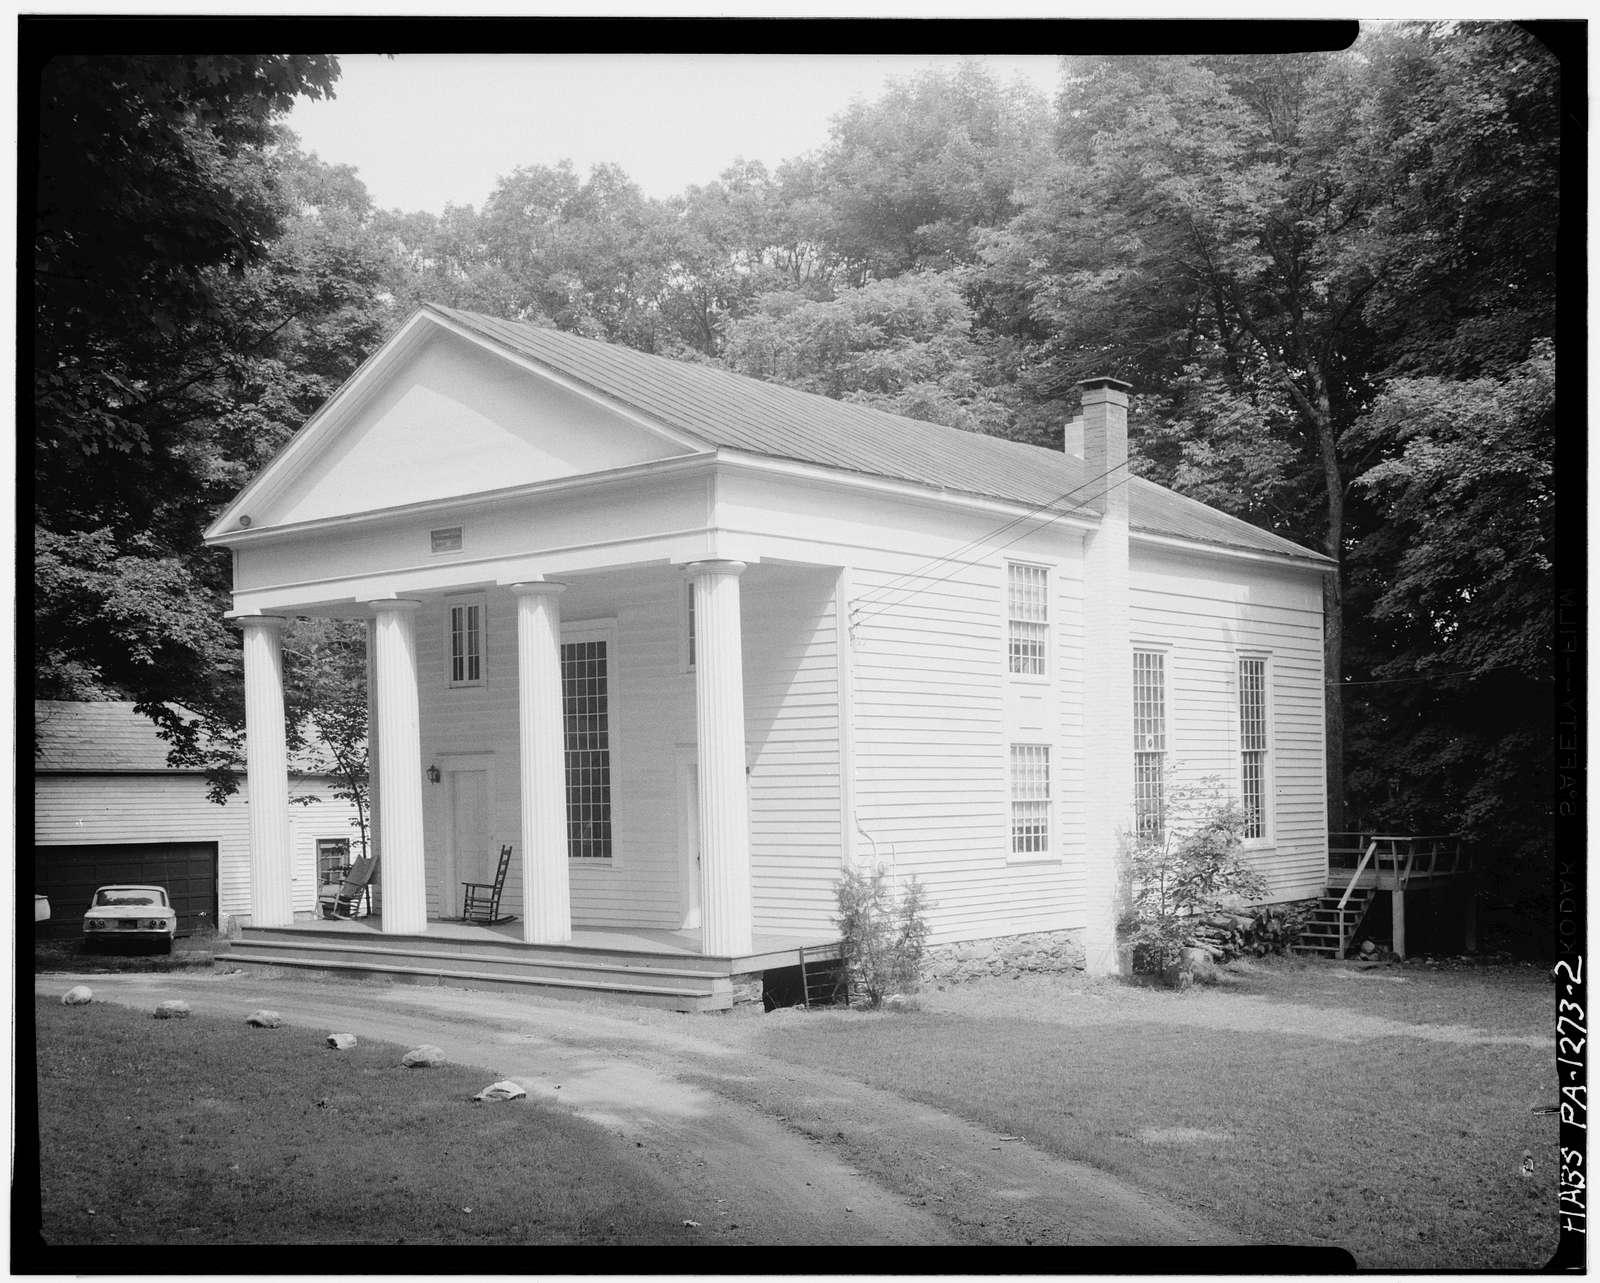 Dutch Reformed Church, Dingmans Ferry, Pike County, PA